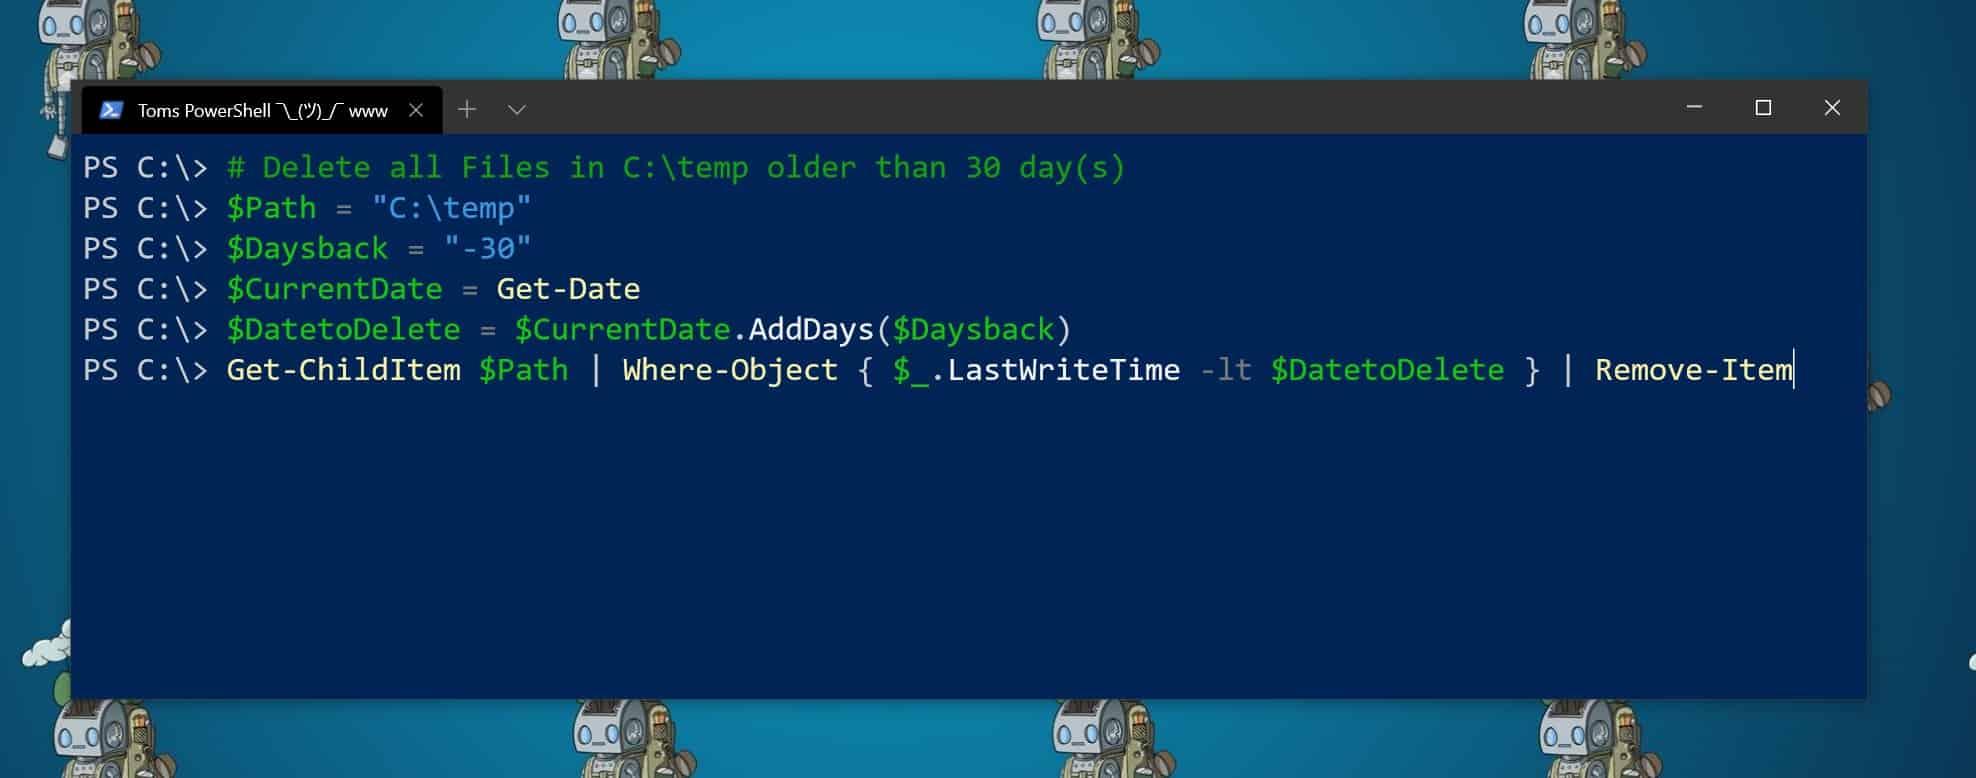 PowerShell Delete Files older than